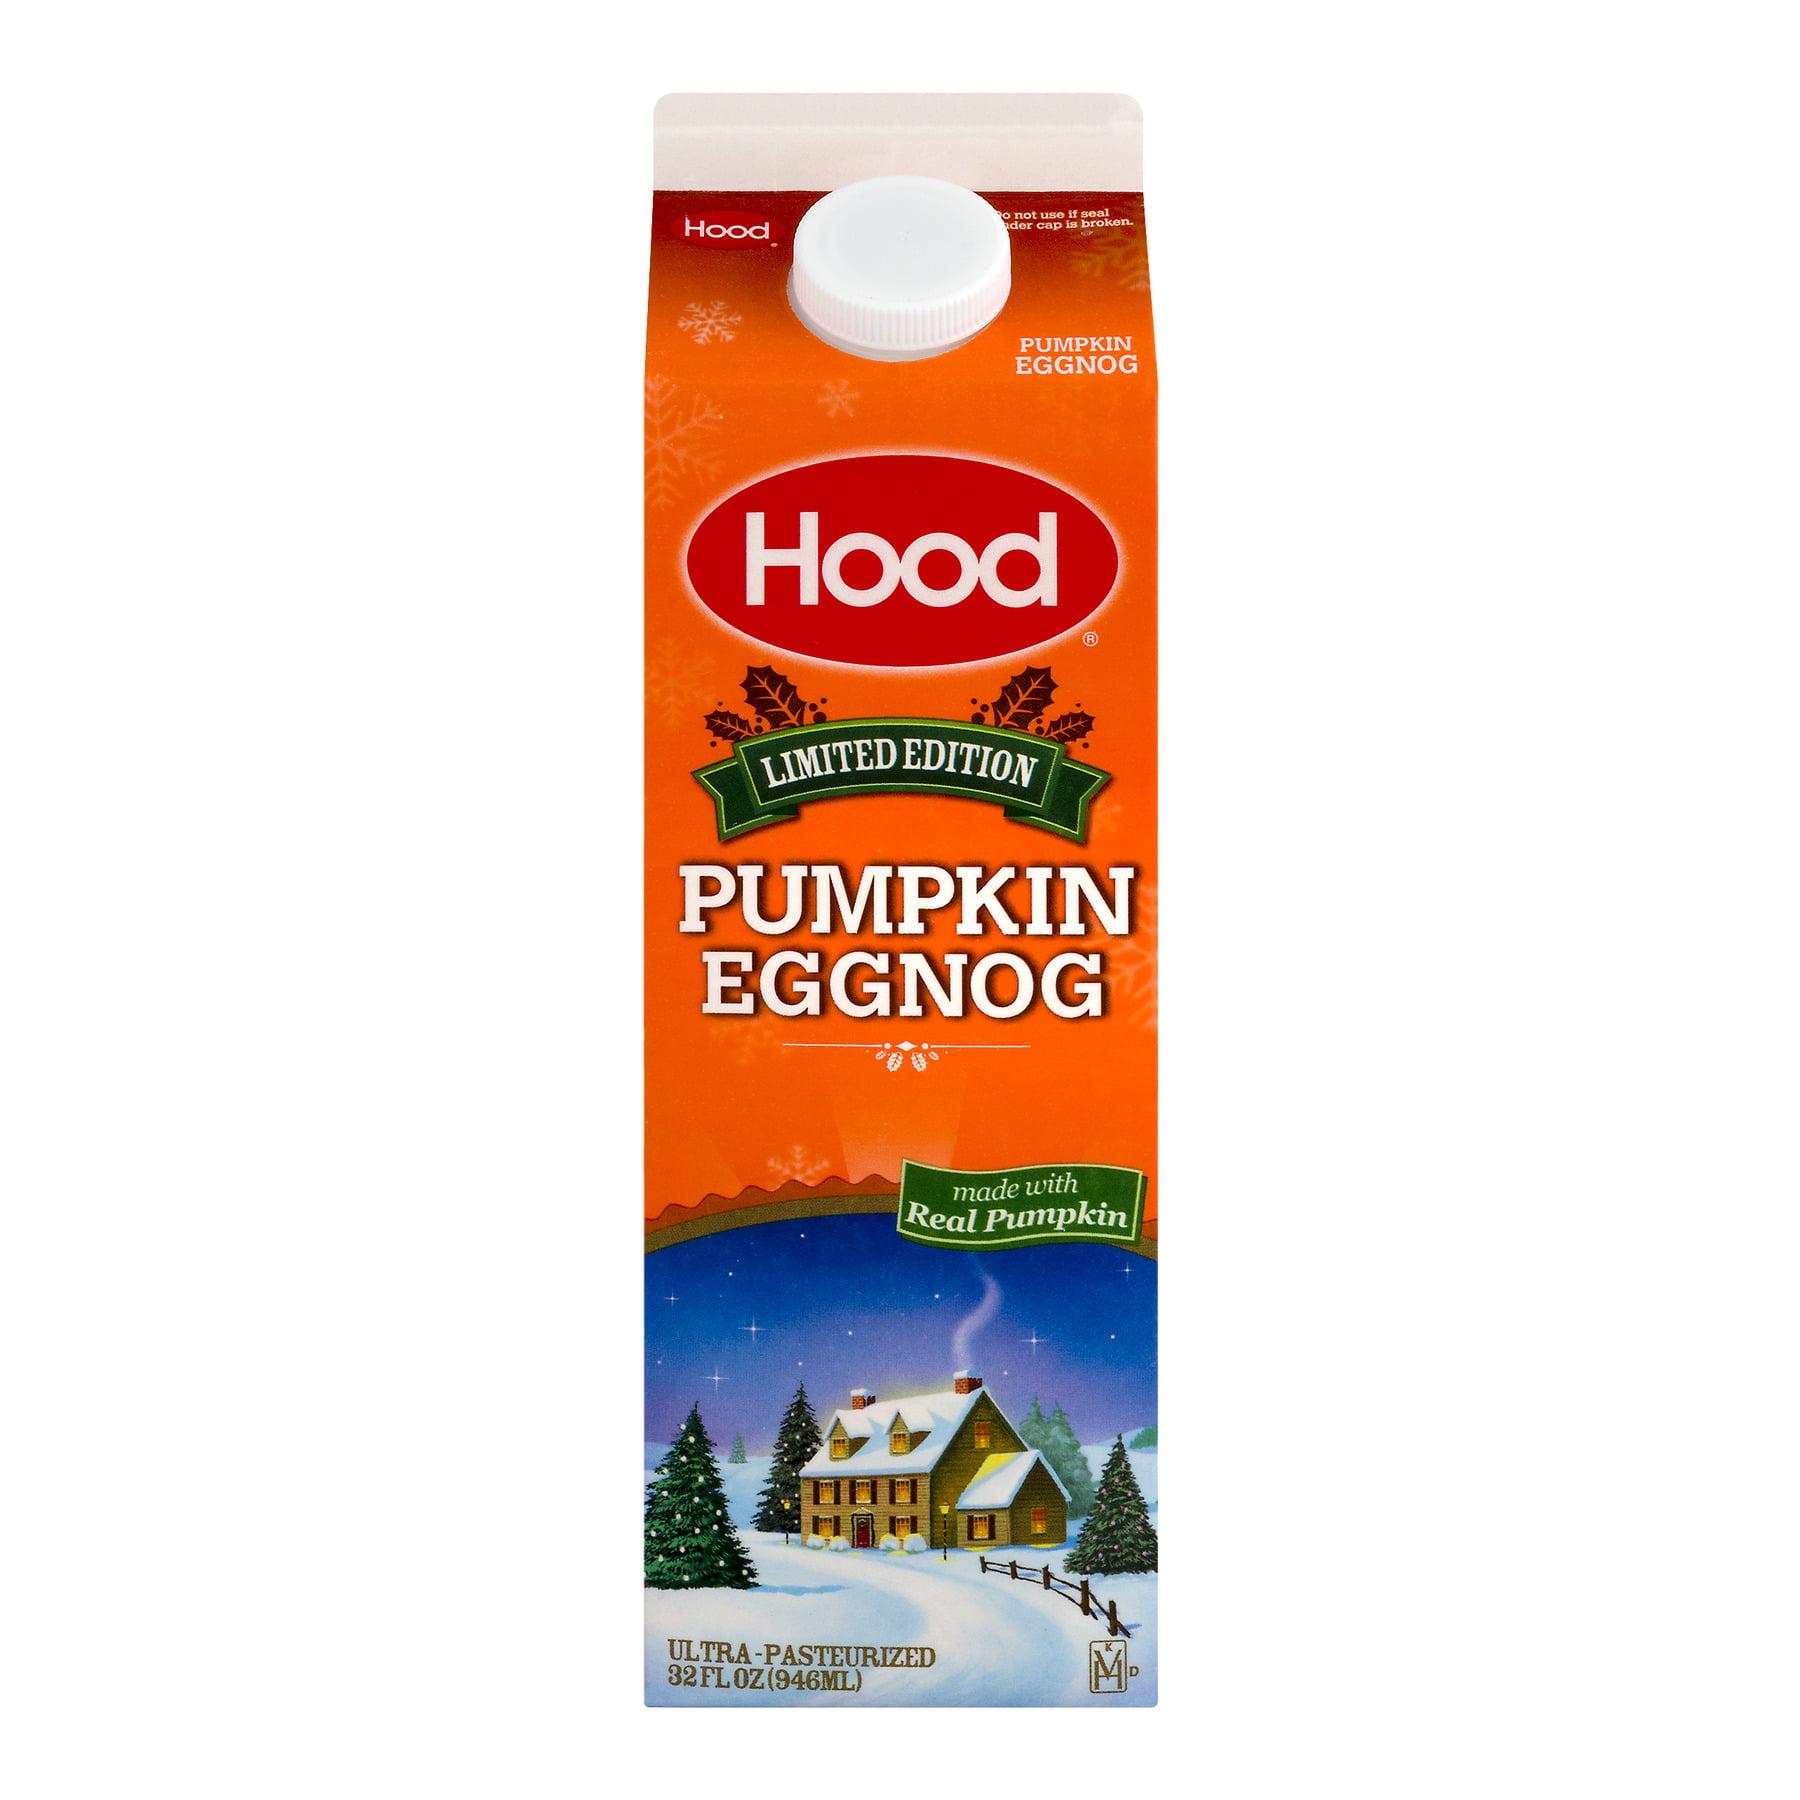 Hood® Limited Edition Pumpkin Eggnog 32 fl. oz. Carton